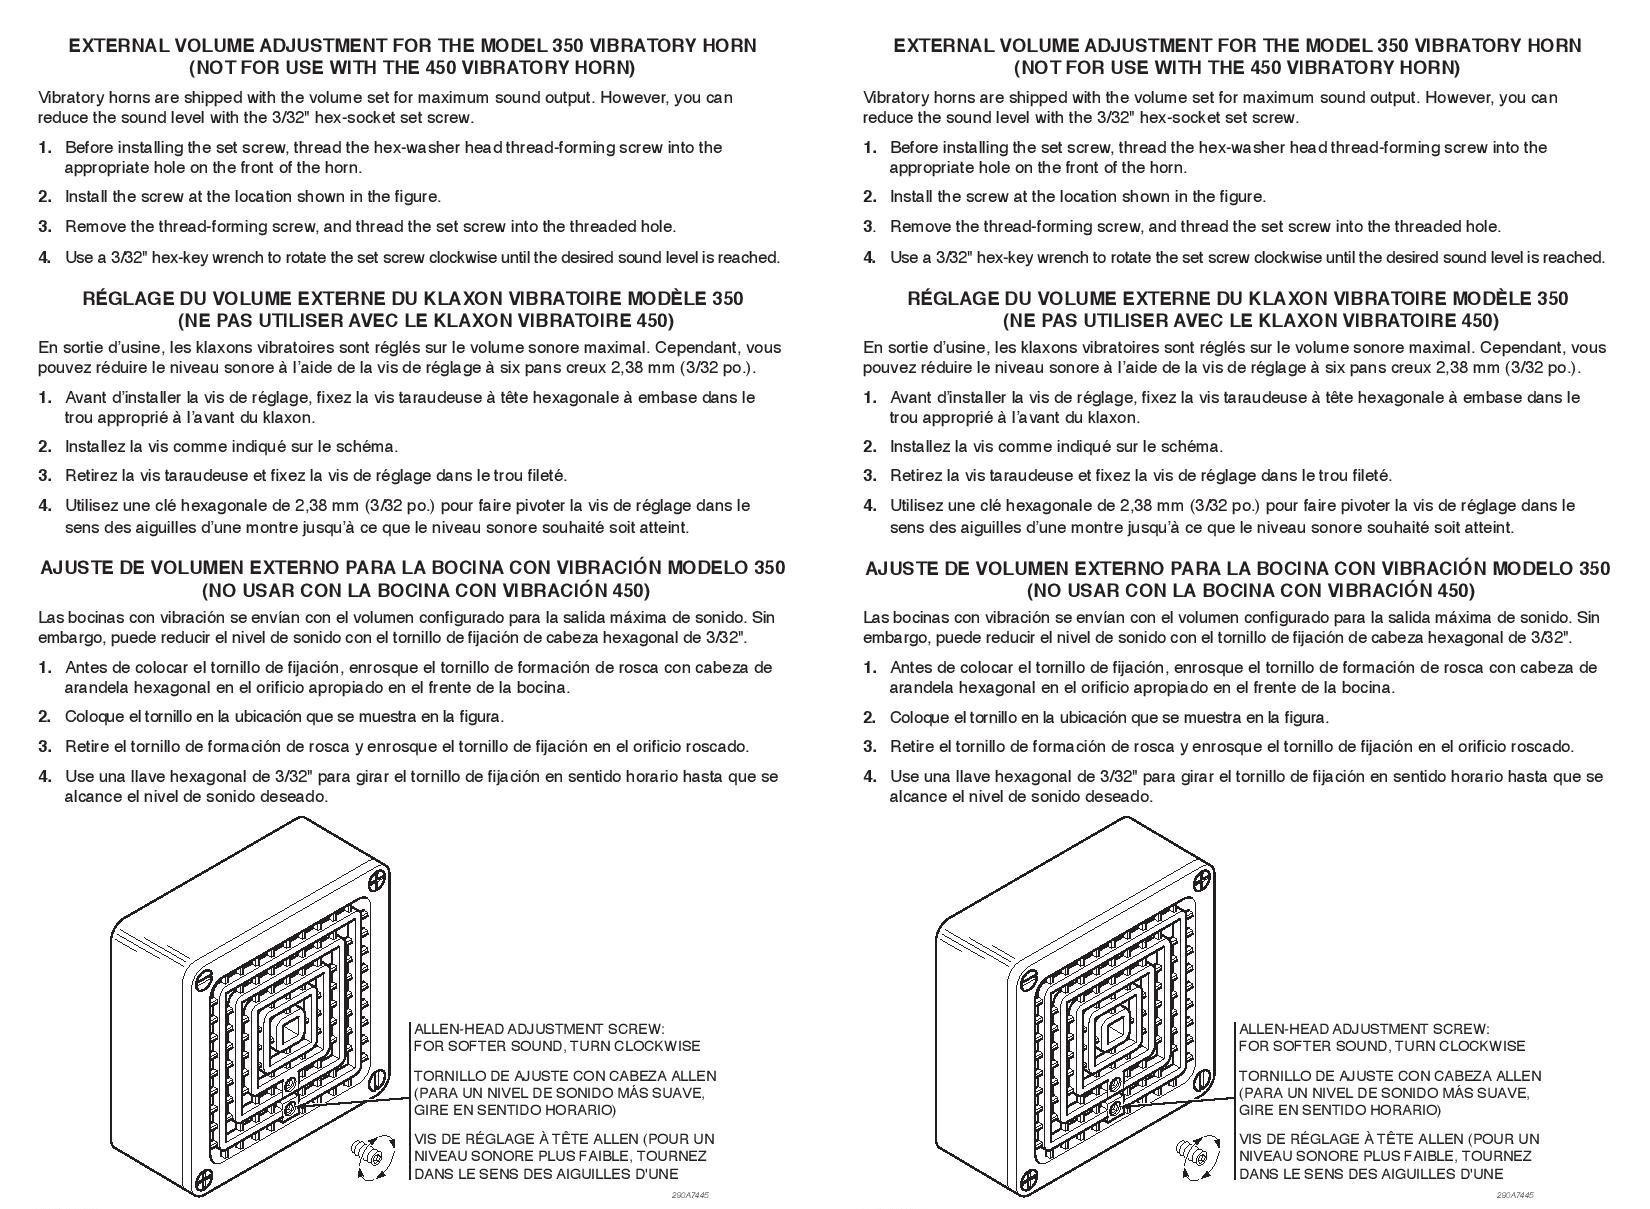 Buzzer Volume Adjustment Kit